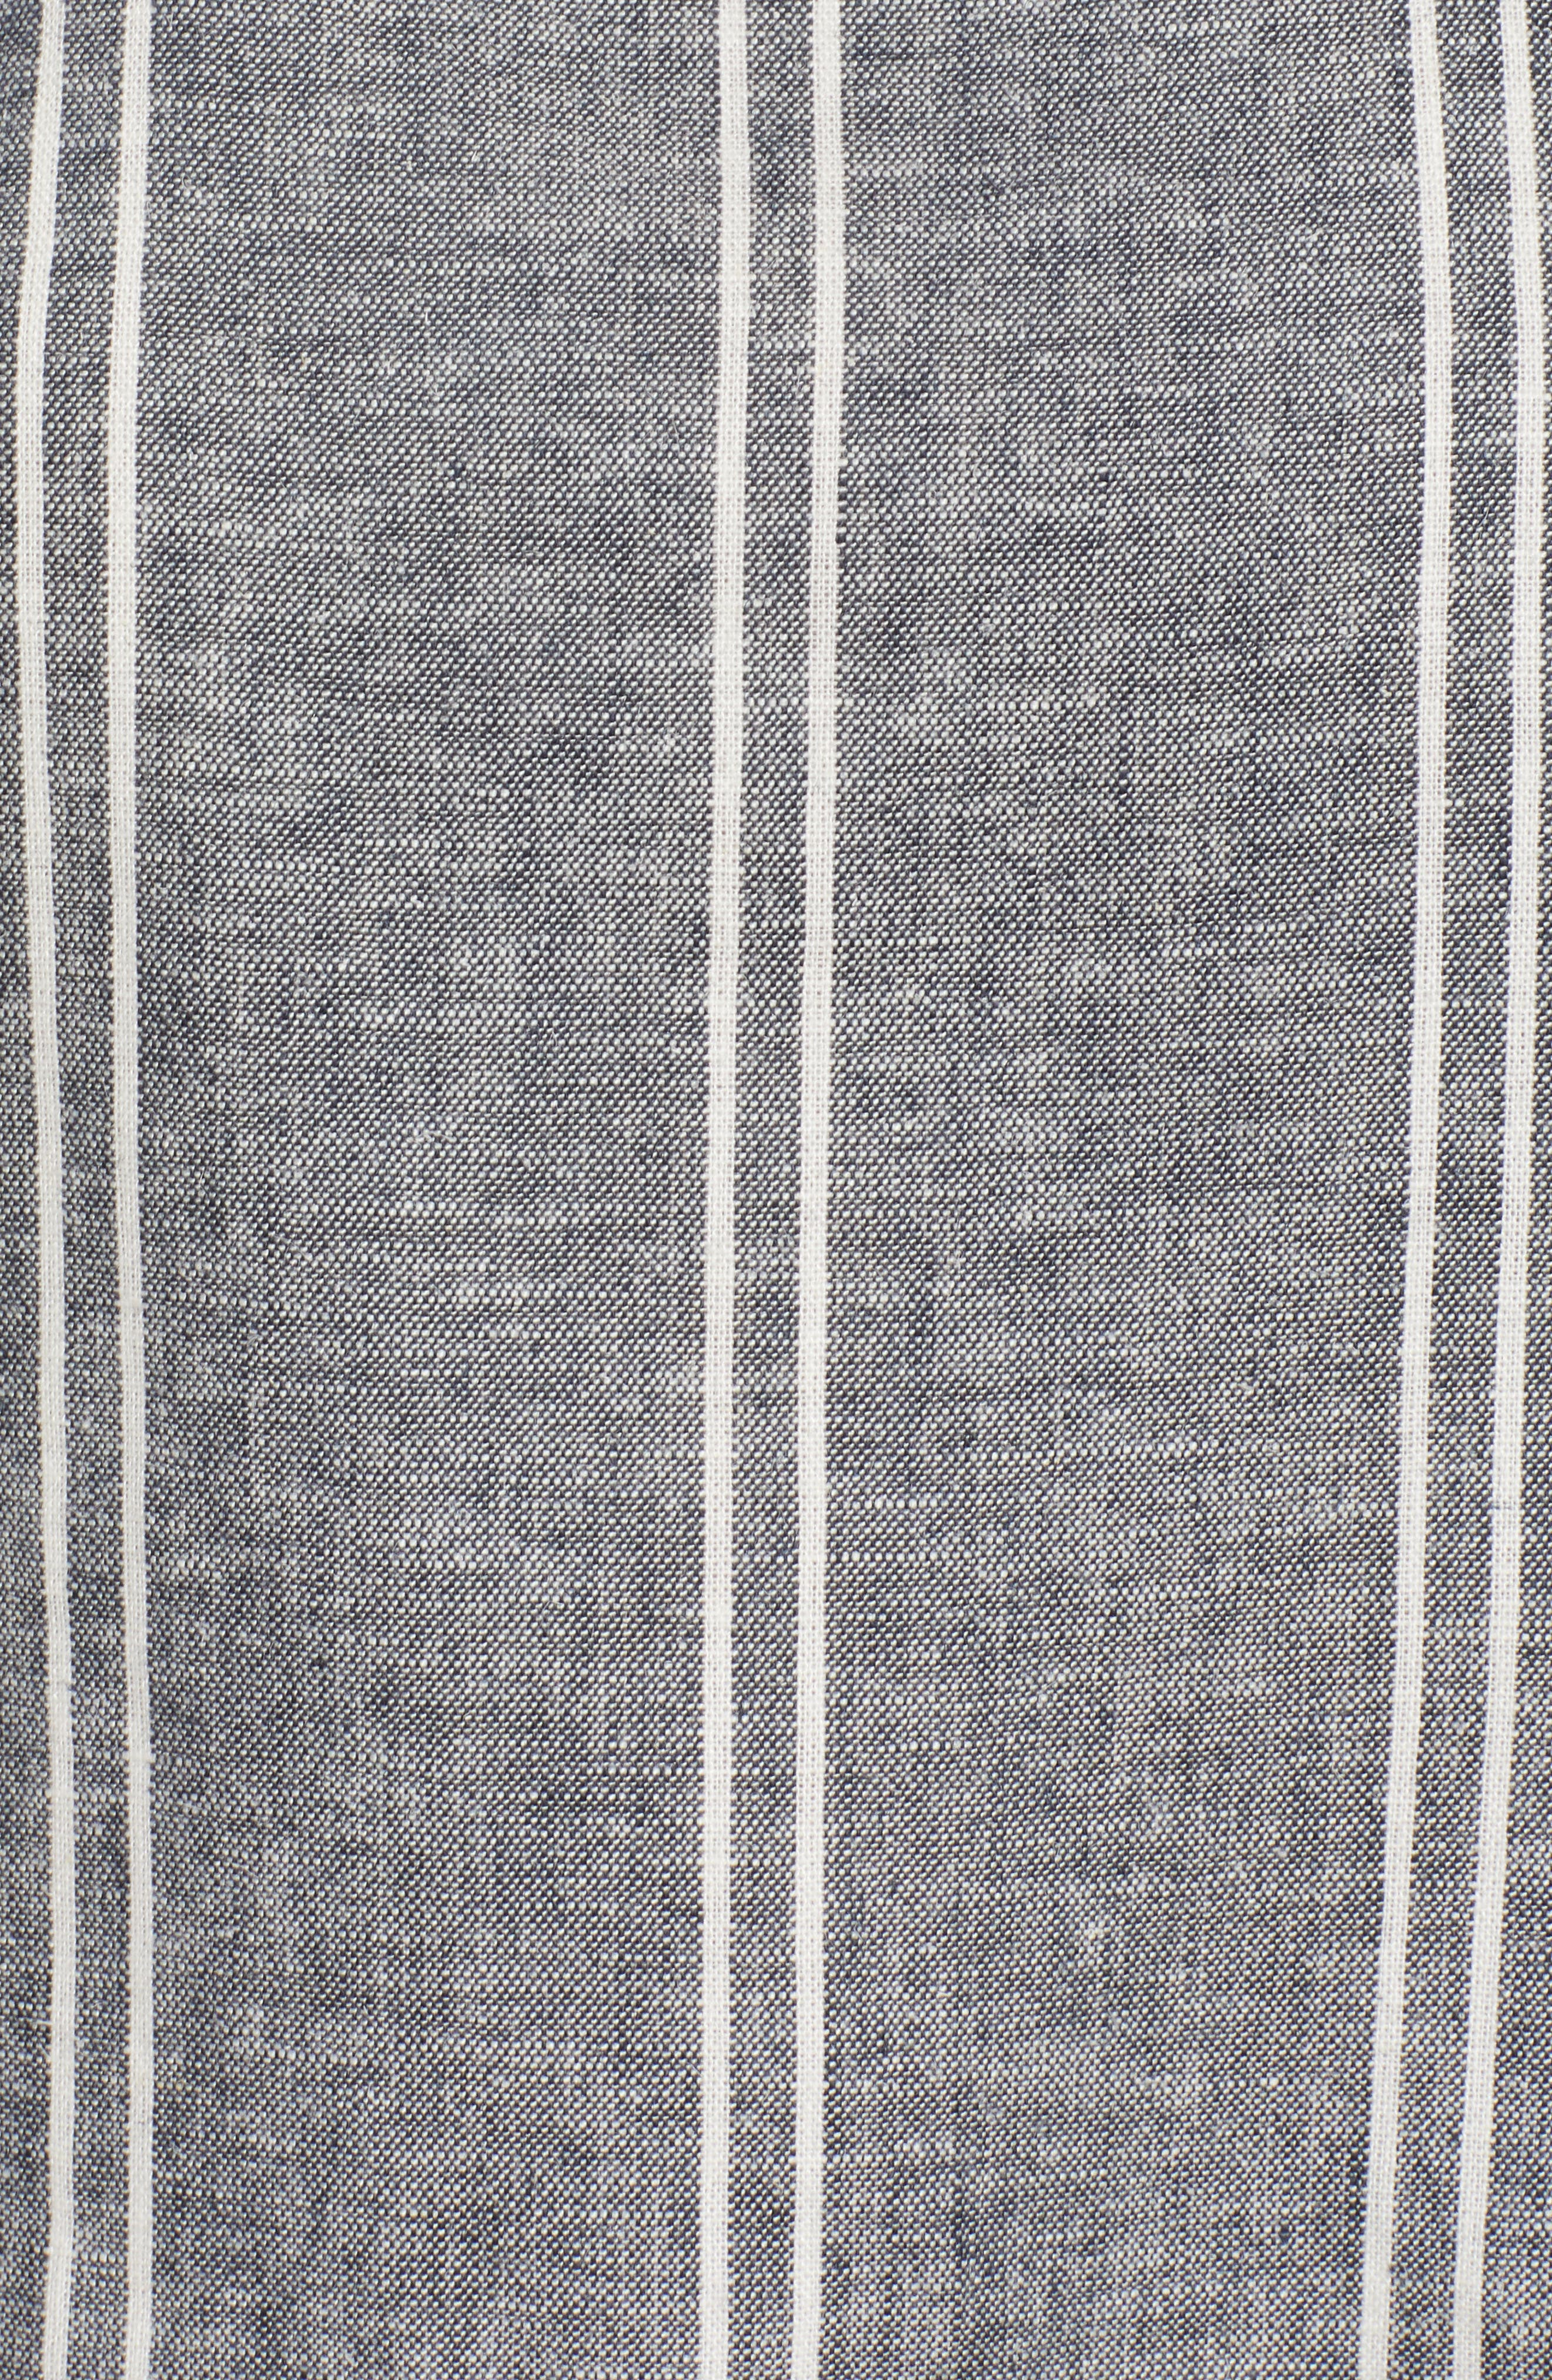 Stripe Linen Blend Tank,                             Alternate thumbnail 6, color,                             Navy Peacoat Chambray Stripe